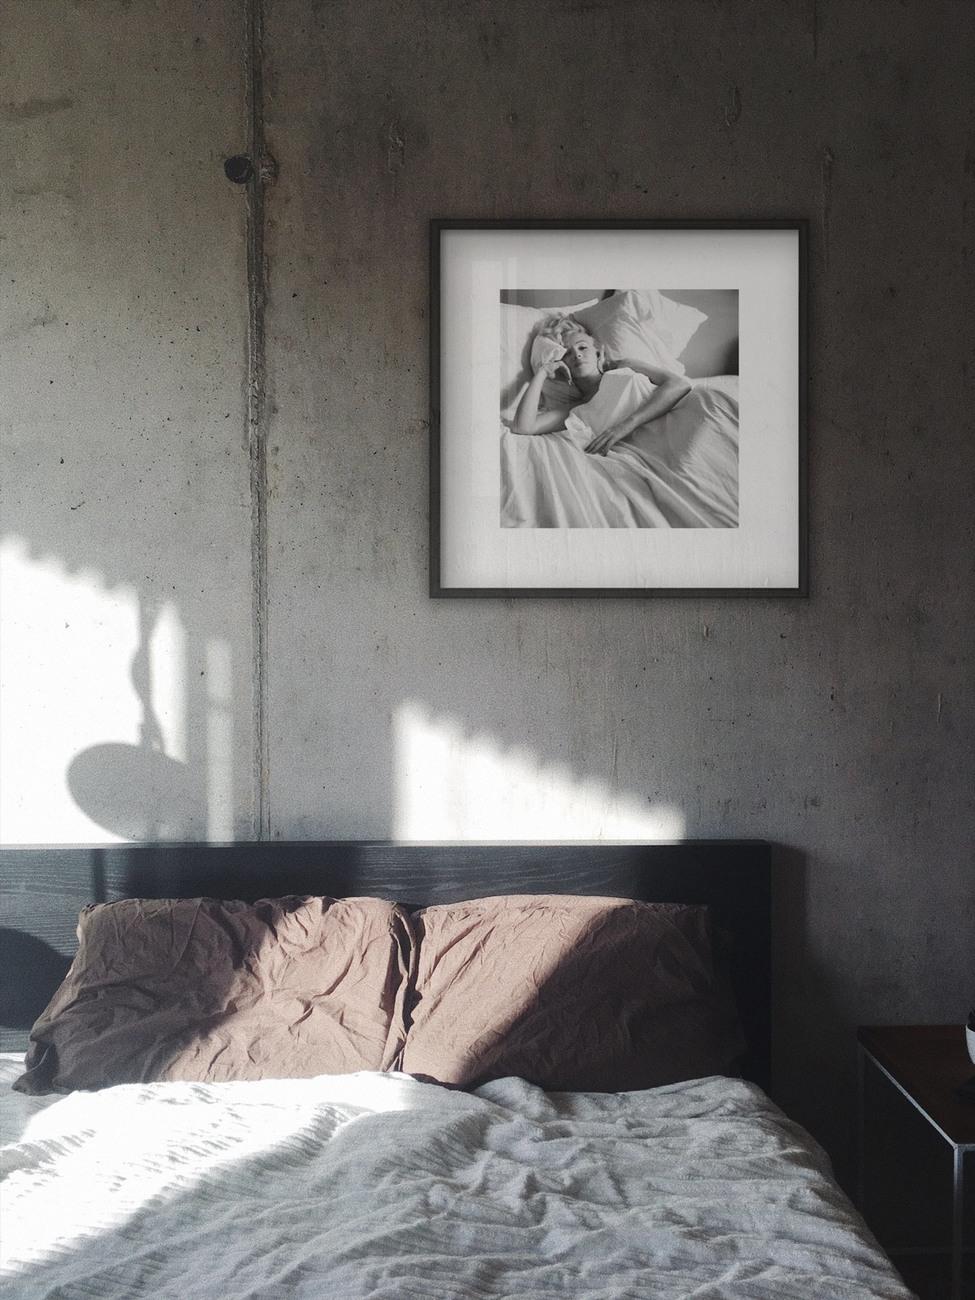 Marilyn Monroe - Bed Reproduction de Tableau